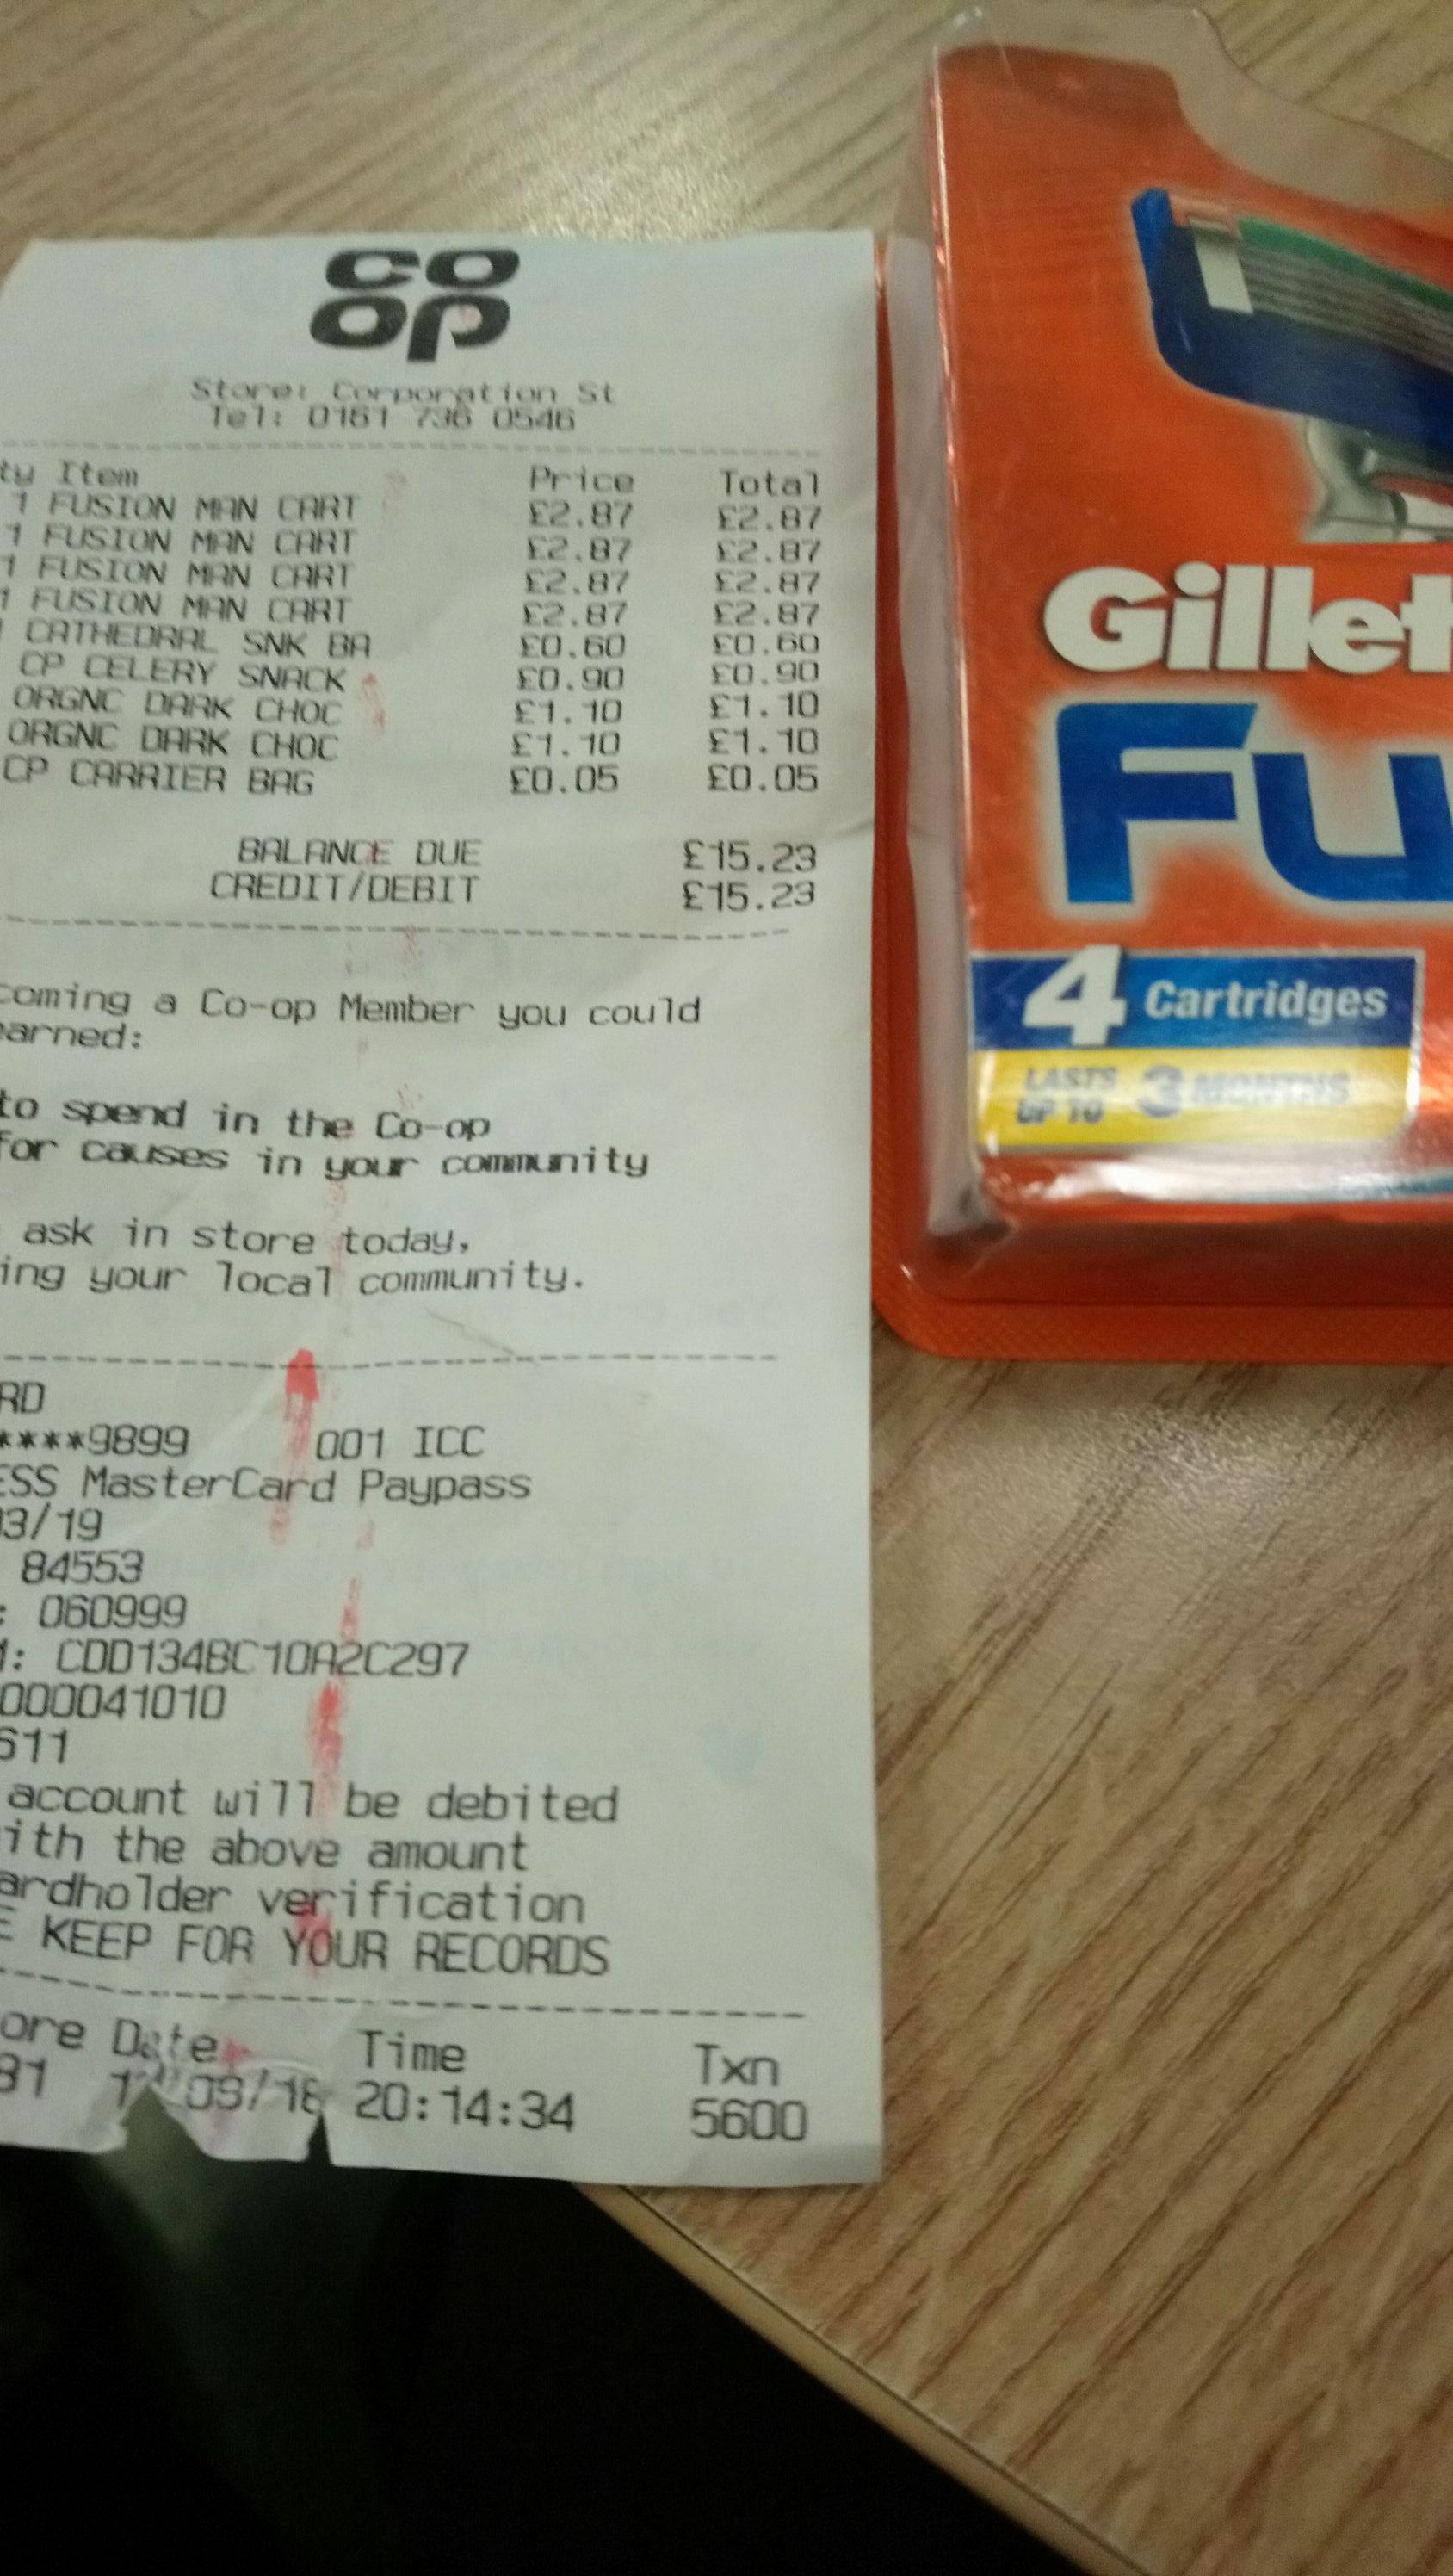 Gillette Fusion Razor Blades 4s Co-op in store (Printworks, MCR) - £2.87